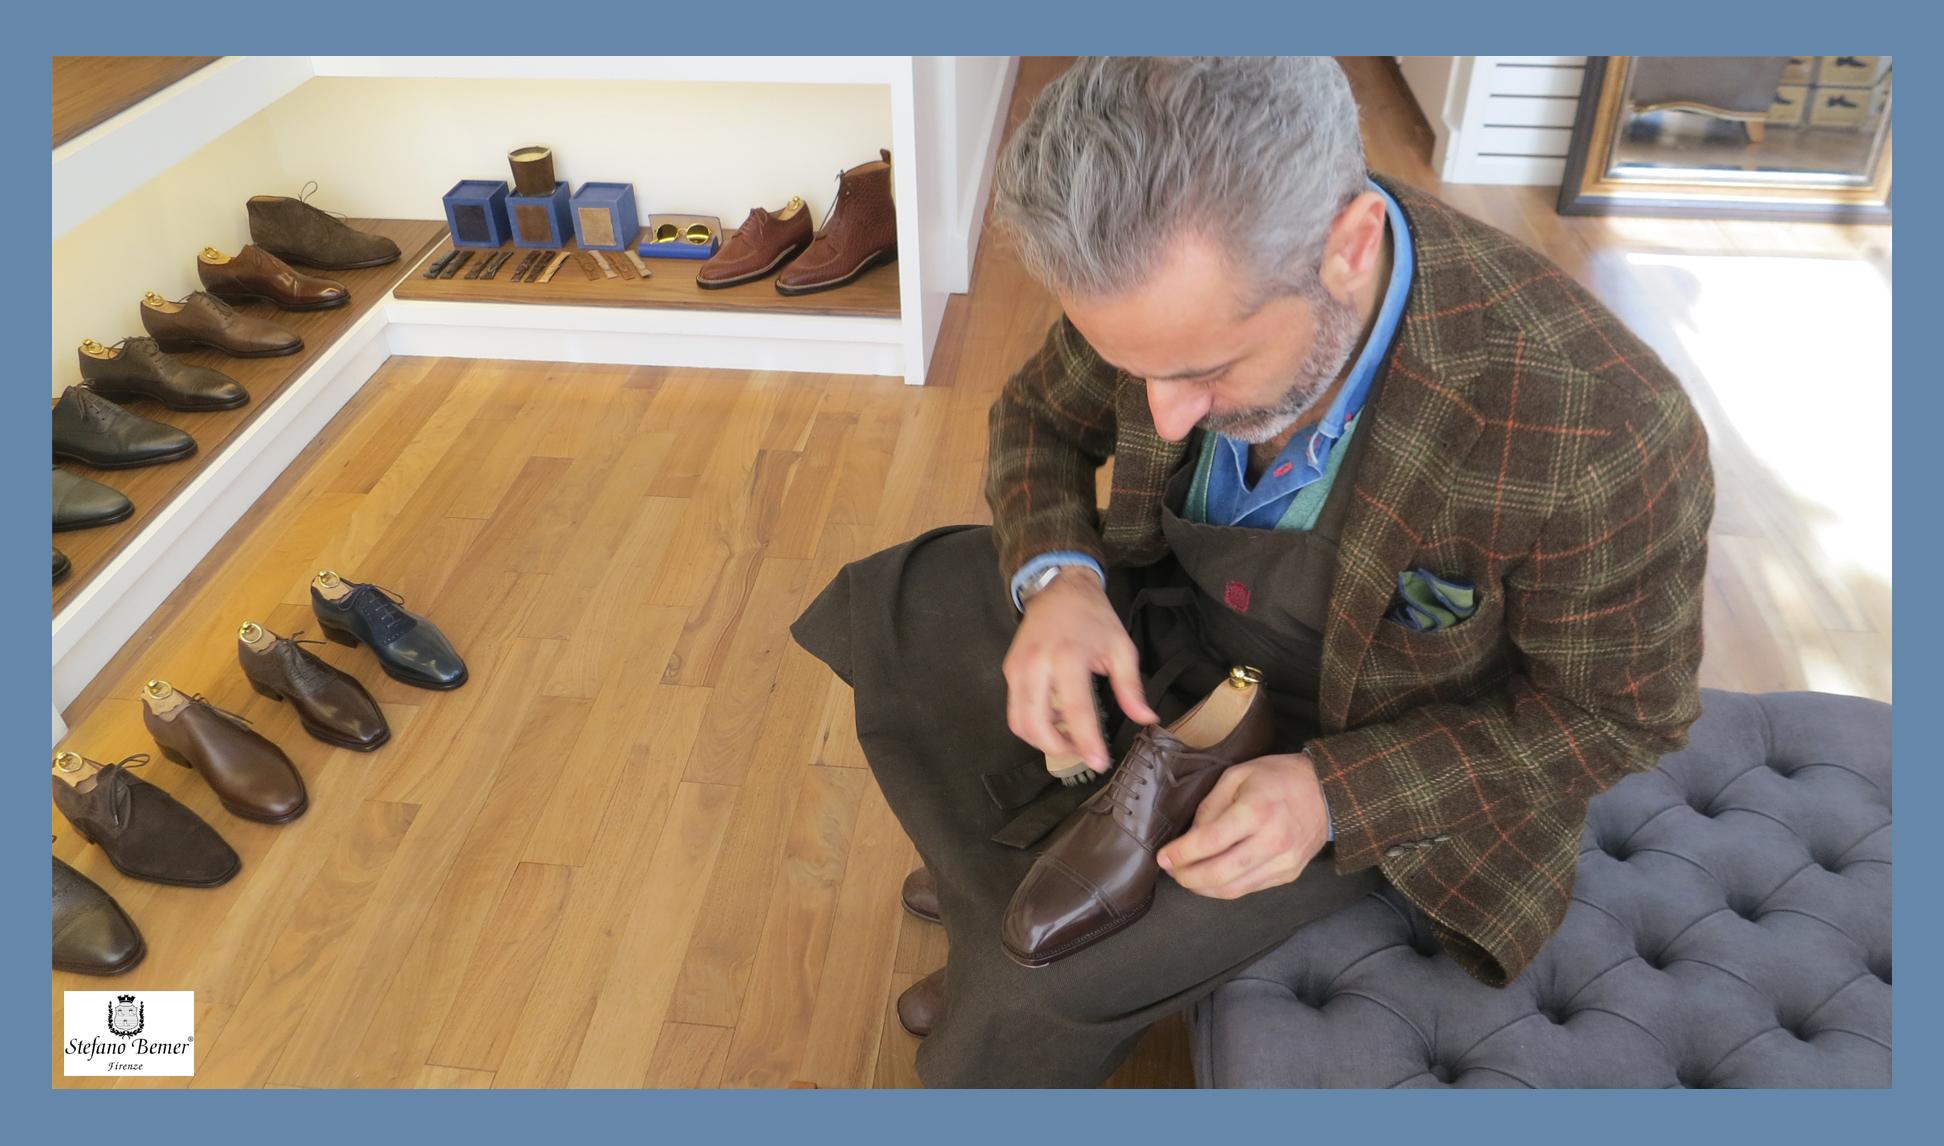 Stefano Bemer – Fine Italian Shoes